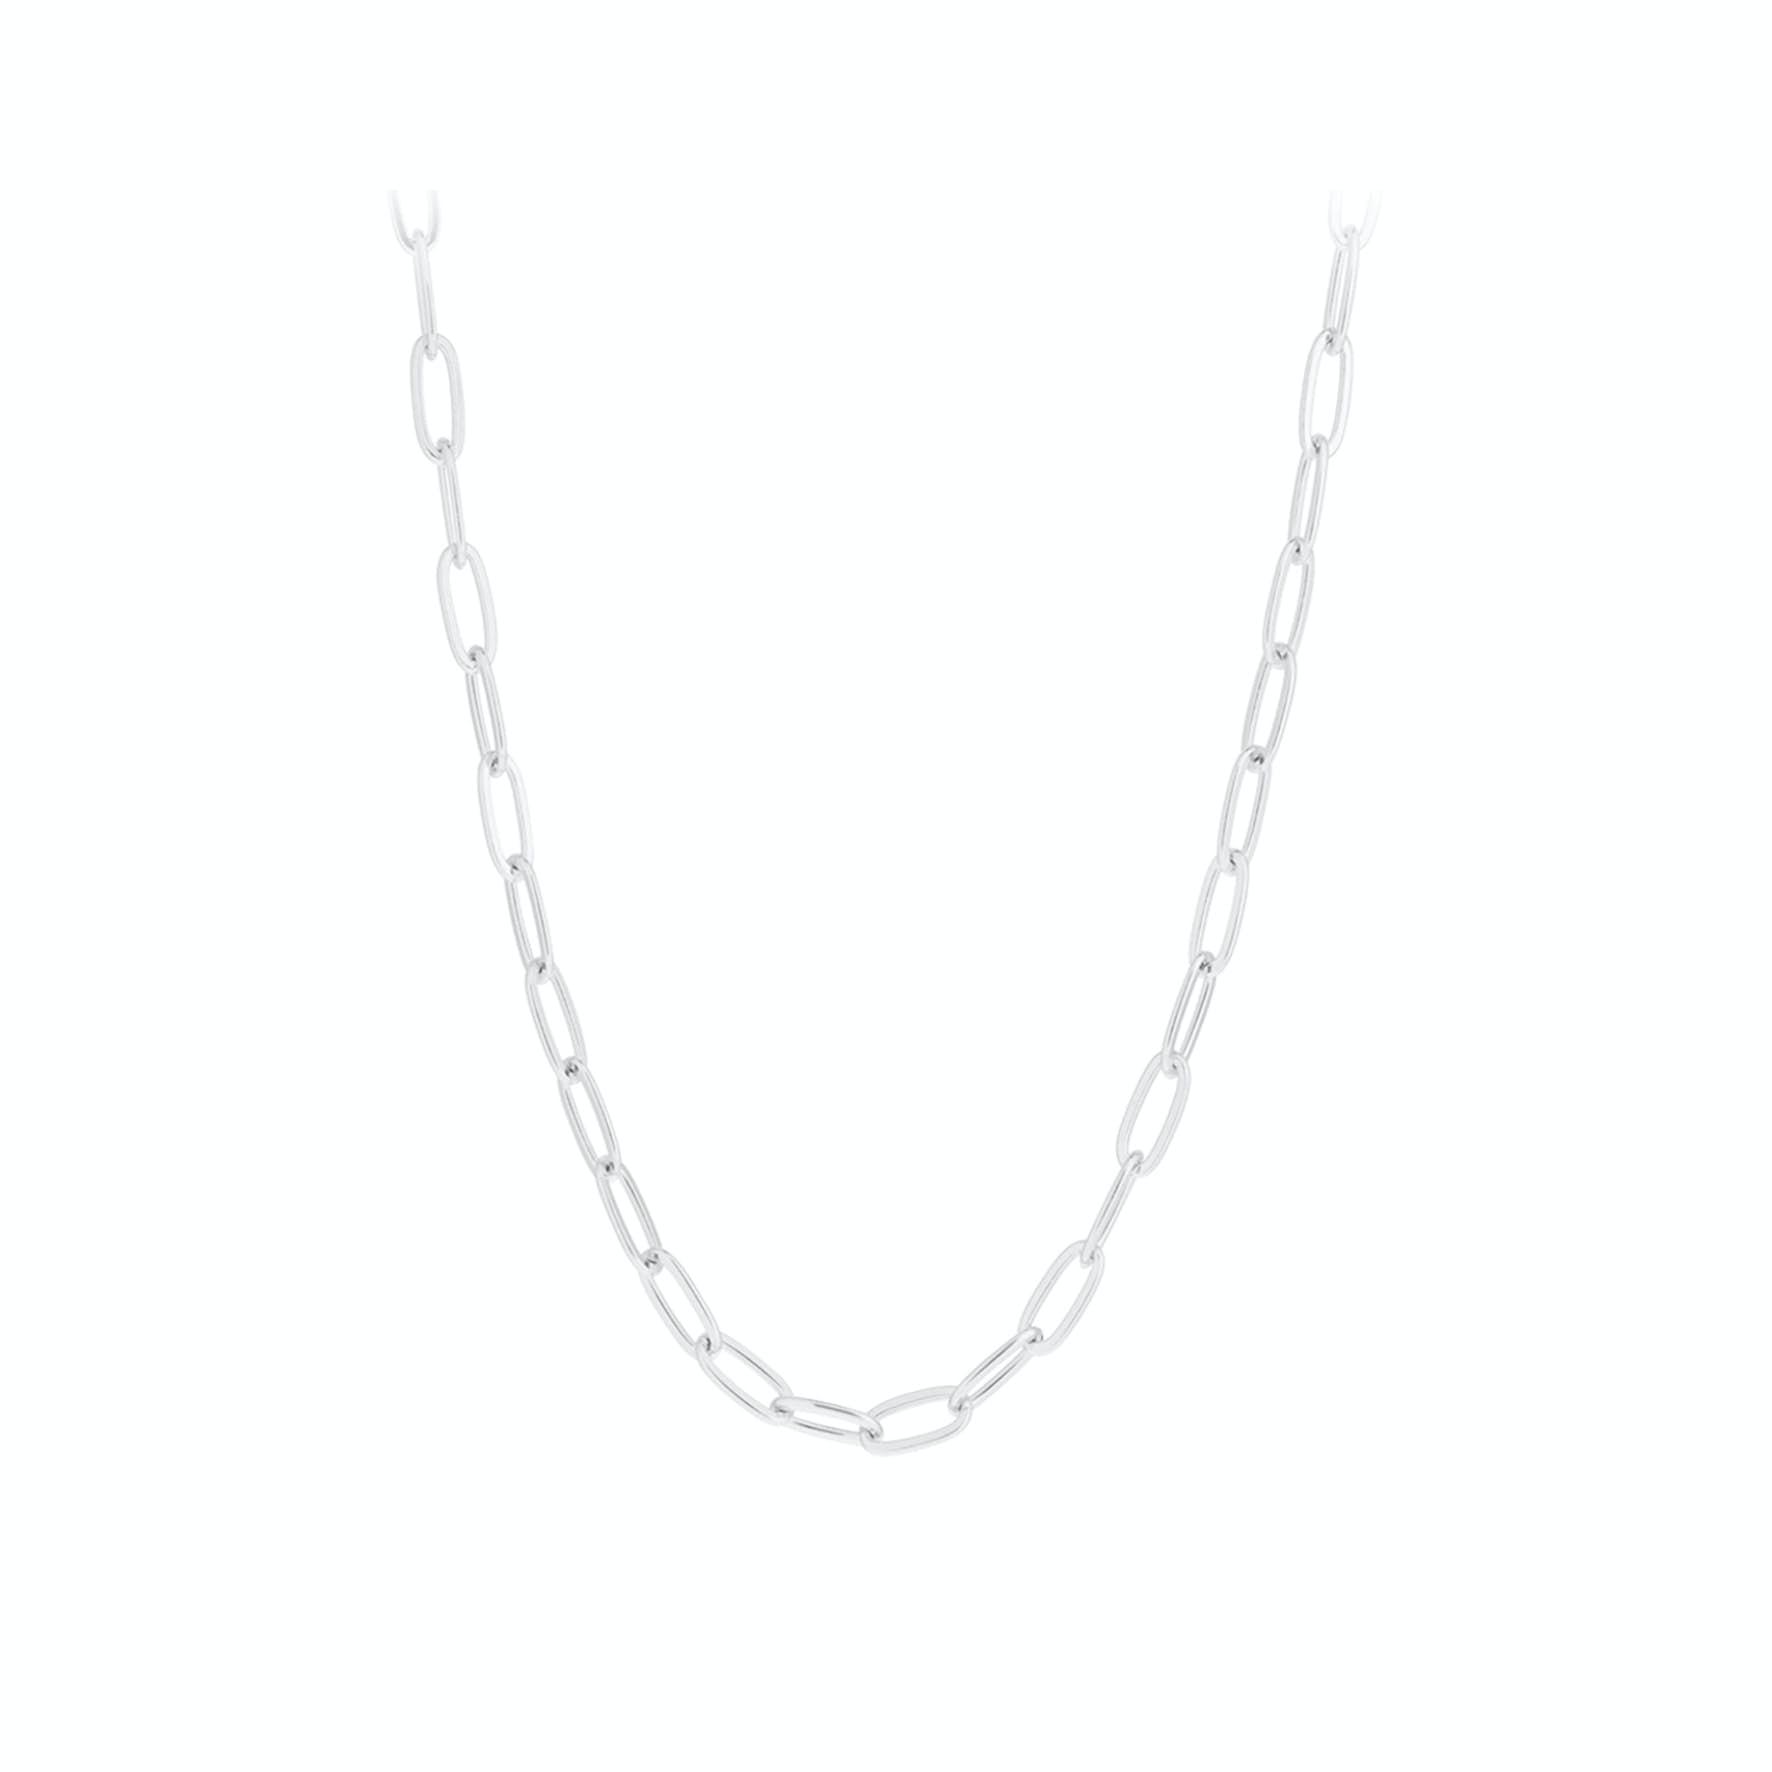 Esther Necklace från Pernille Corydon i Silver Sterling 925